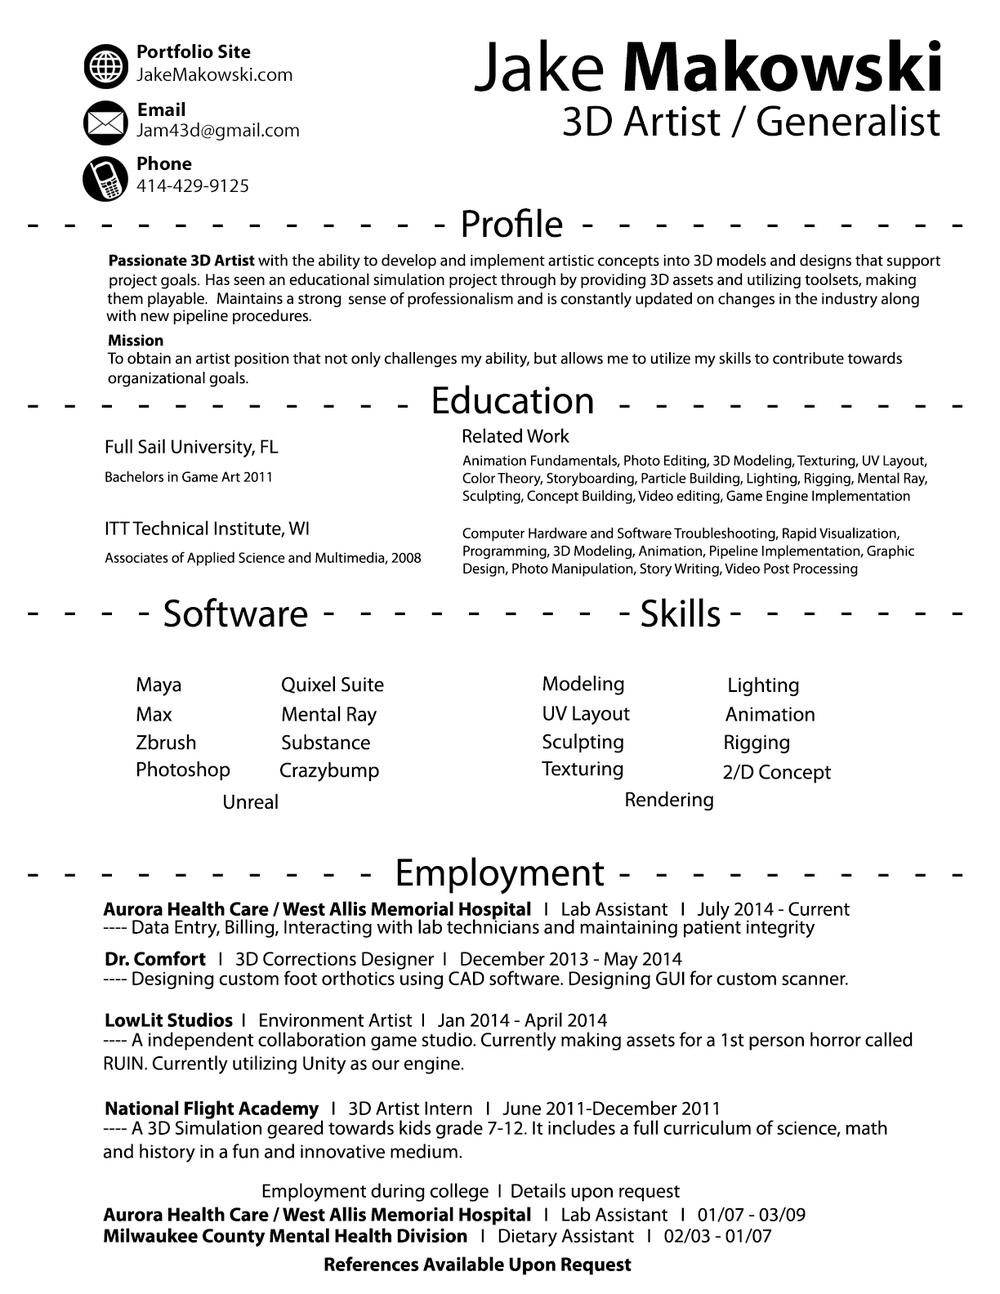 Tech Resume   Resume Badak Pinterest     cover letter Resume In High School Resumehow to do a high school resume  Large size